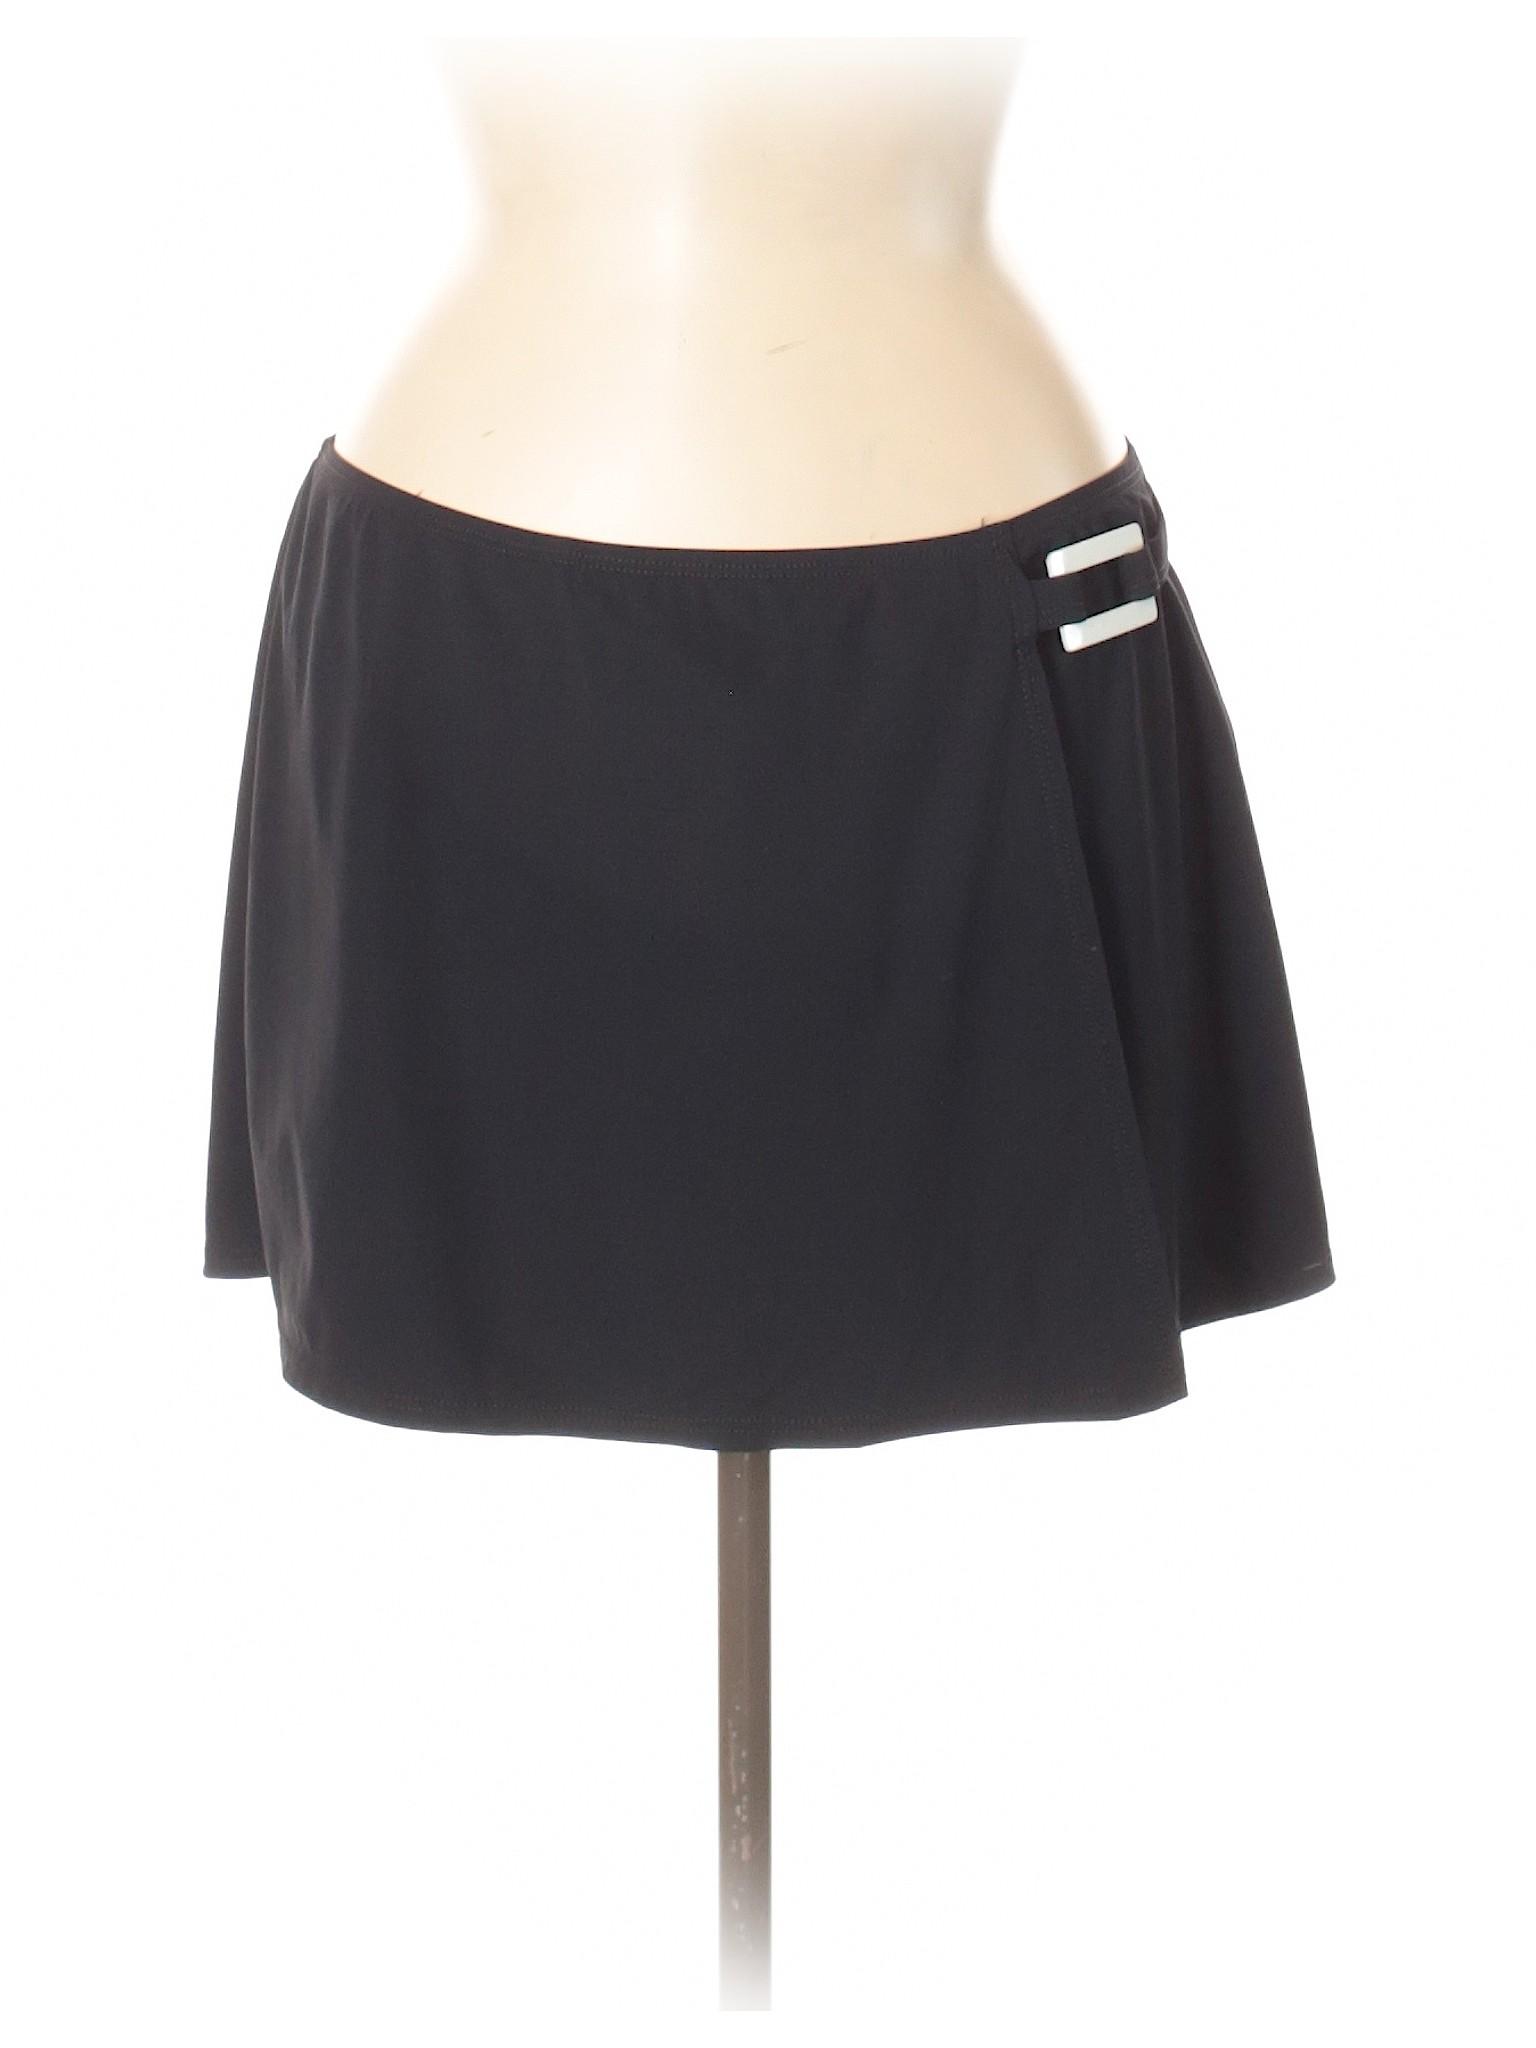 Boutique Casual Skirt Boutique Casual Casual Casual Boutique Skirt Skirt Skirt Boutique YEdTdqw